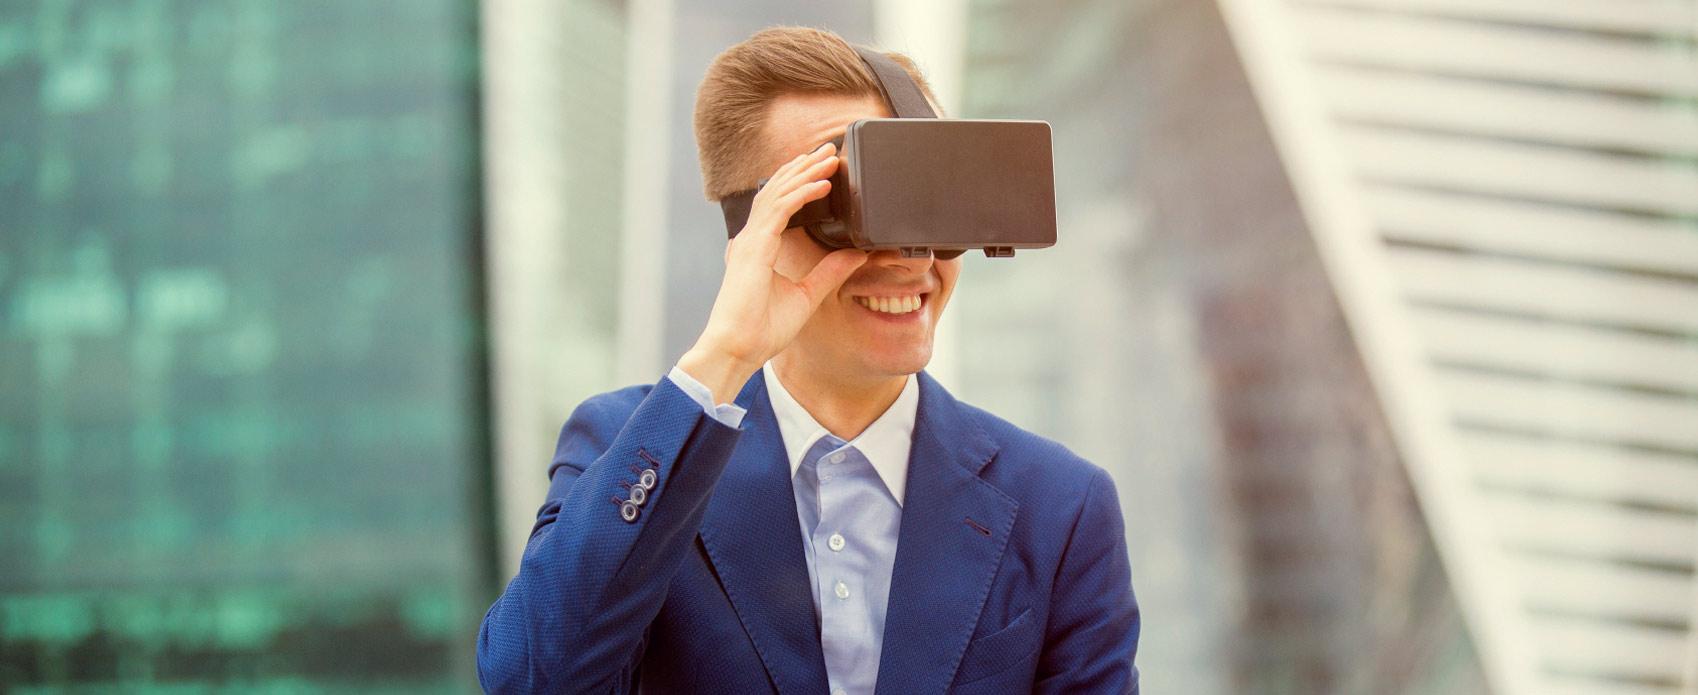 Immobilienbesichtigung Mann virtuell